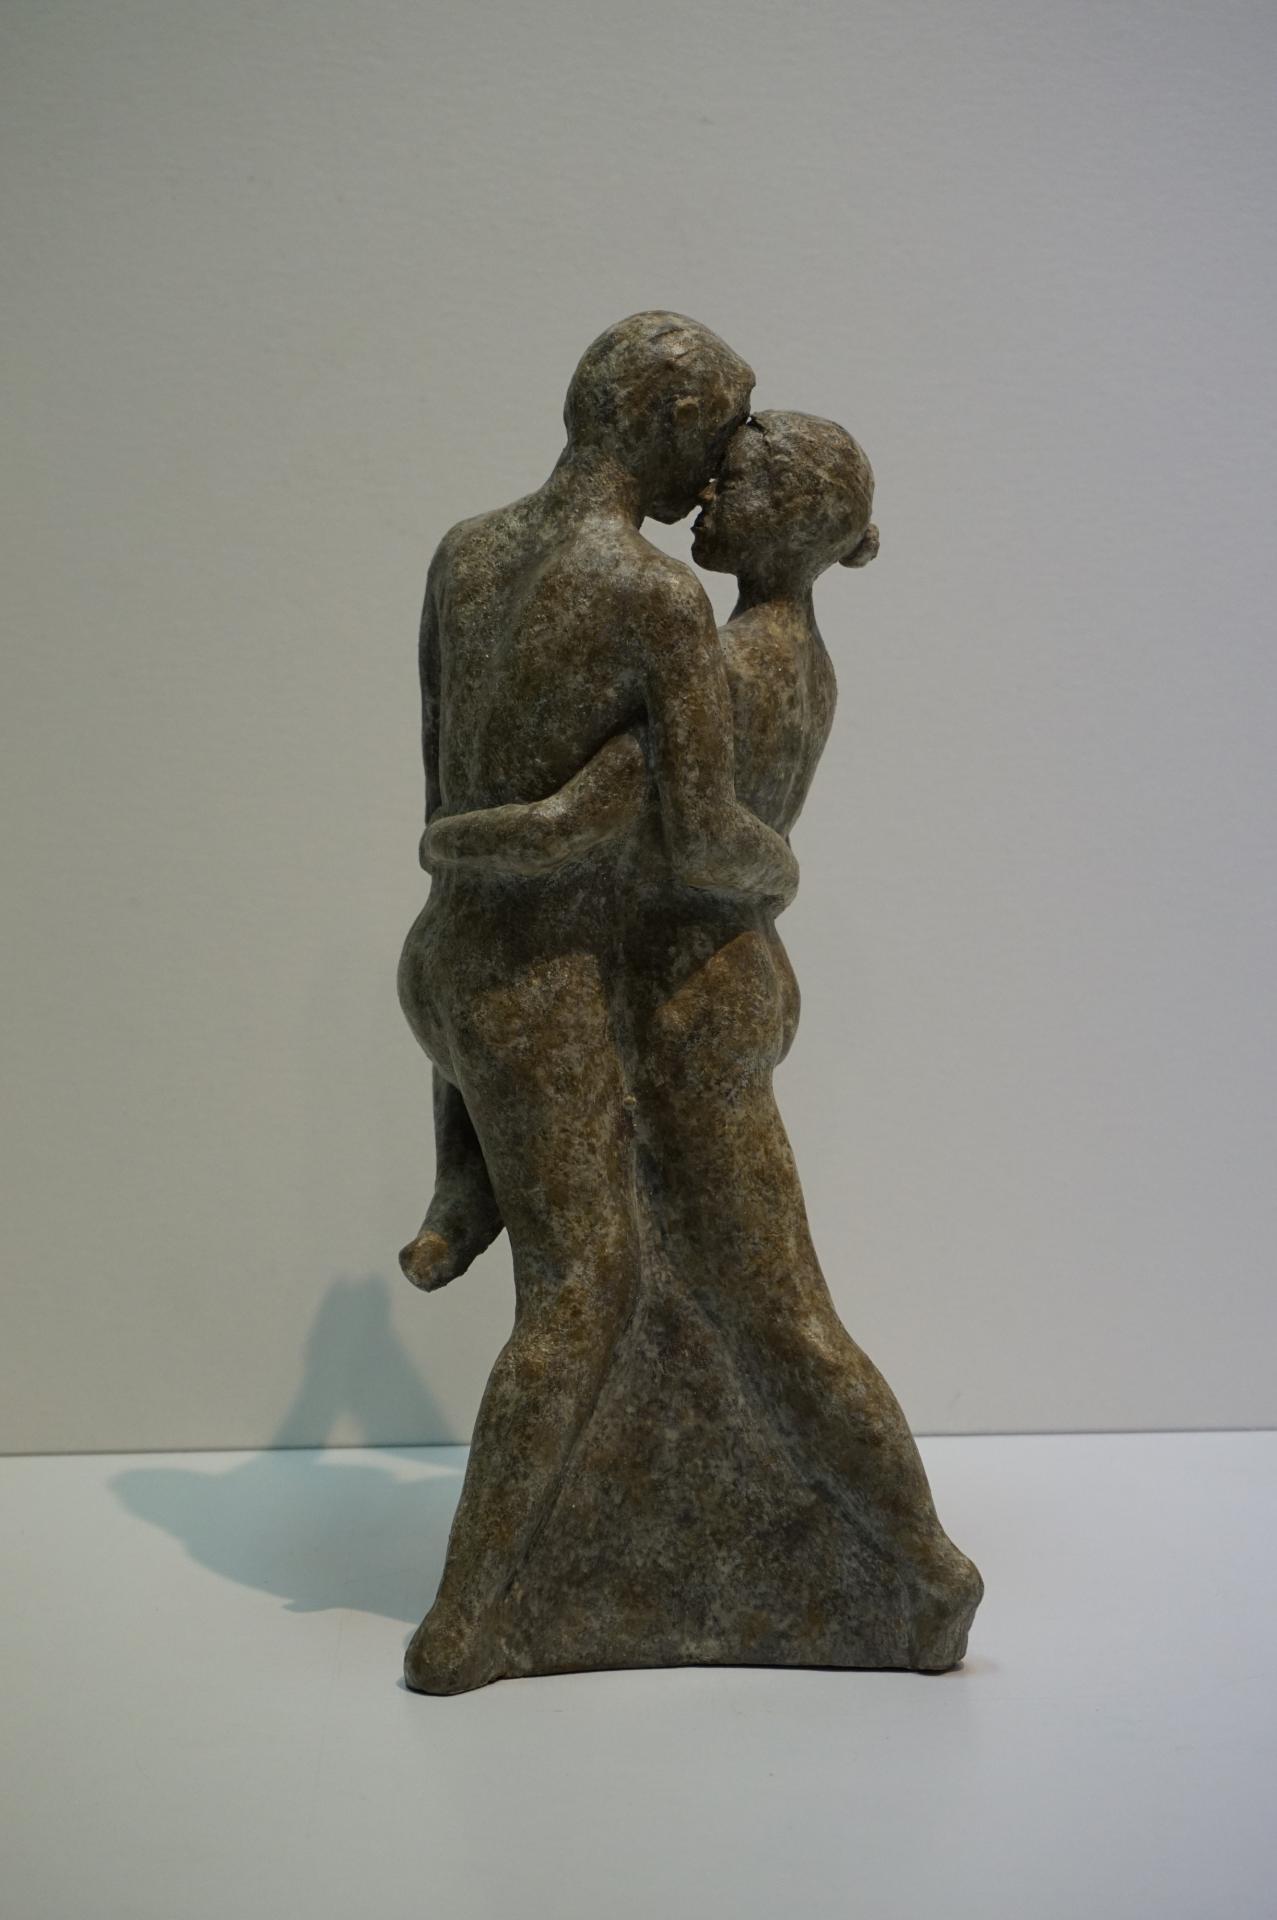 Chaud tango 3